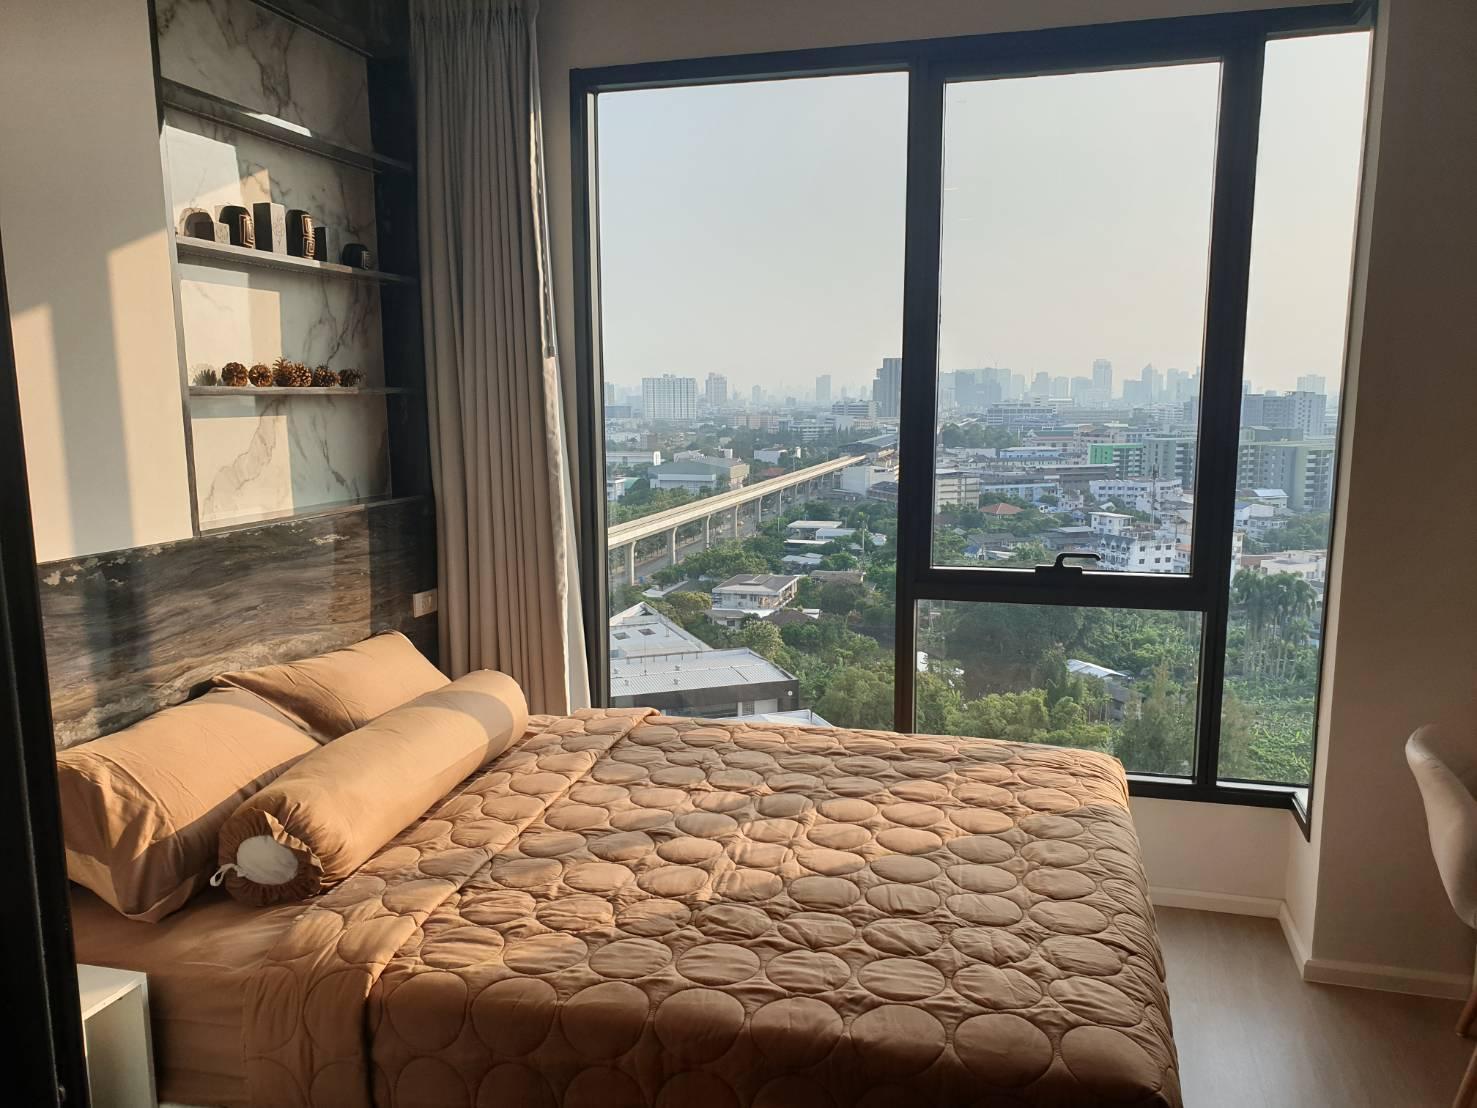 New 1BR Condo @ Sripatum University BTS DMK อพาร์ตเมนต์ 1 ห้องนอน 1 ห้องน้ำส่วนตัว ขนาด 26 ตร.ม. – จตุจักร